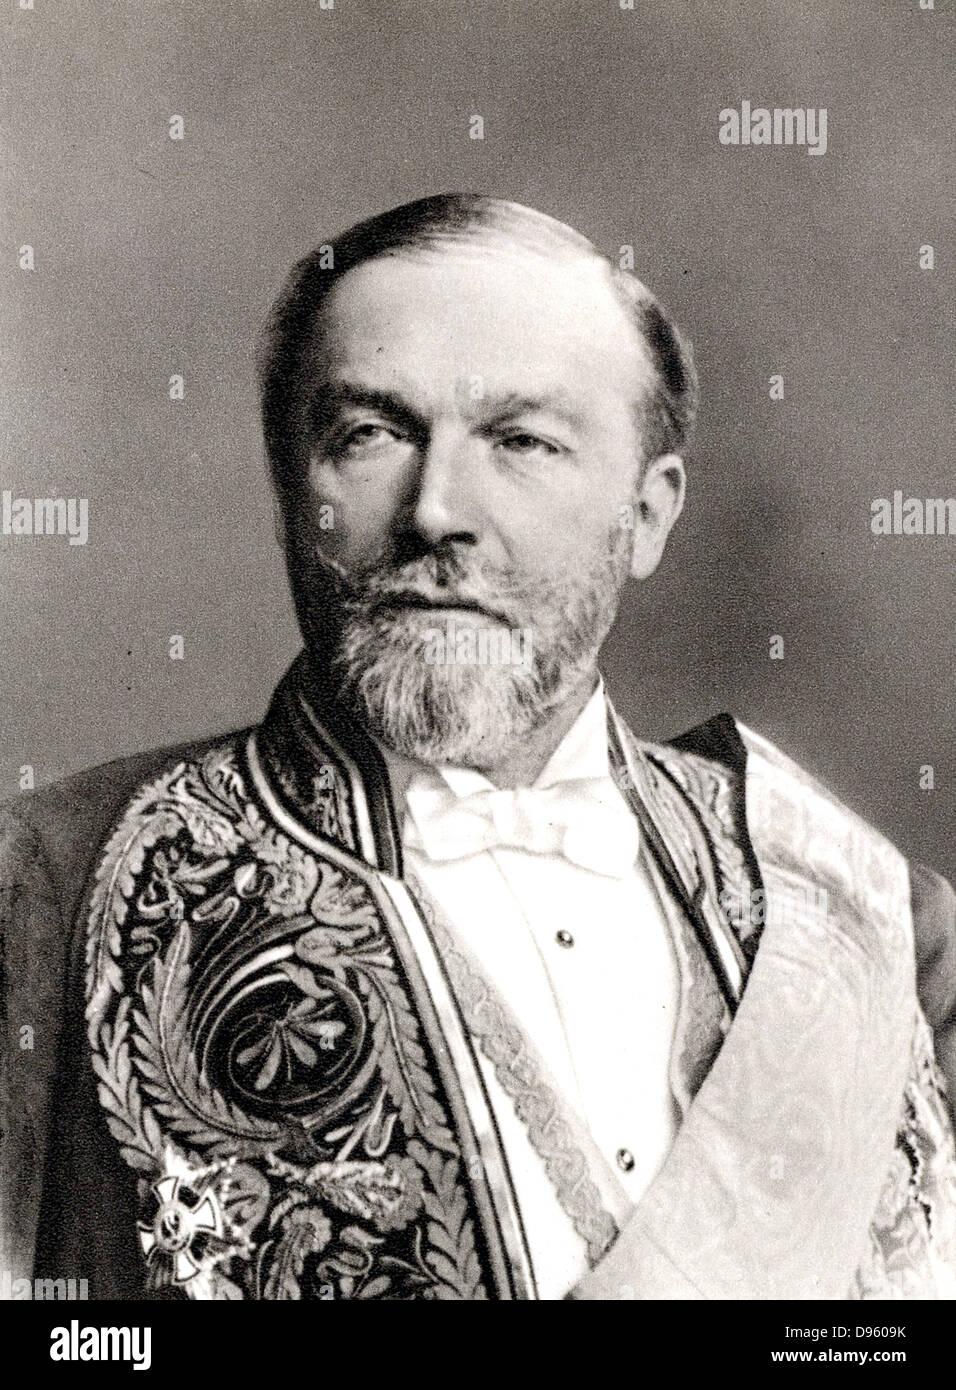 Philip Alexander zu Eulenburg-Hertefeld (1847-1921) German politician and diplomat. Friend of the Kaiser. - Stock Image